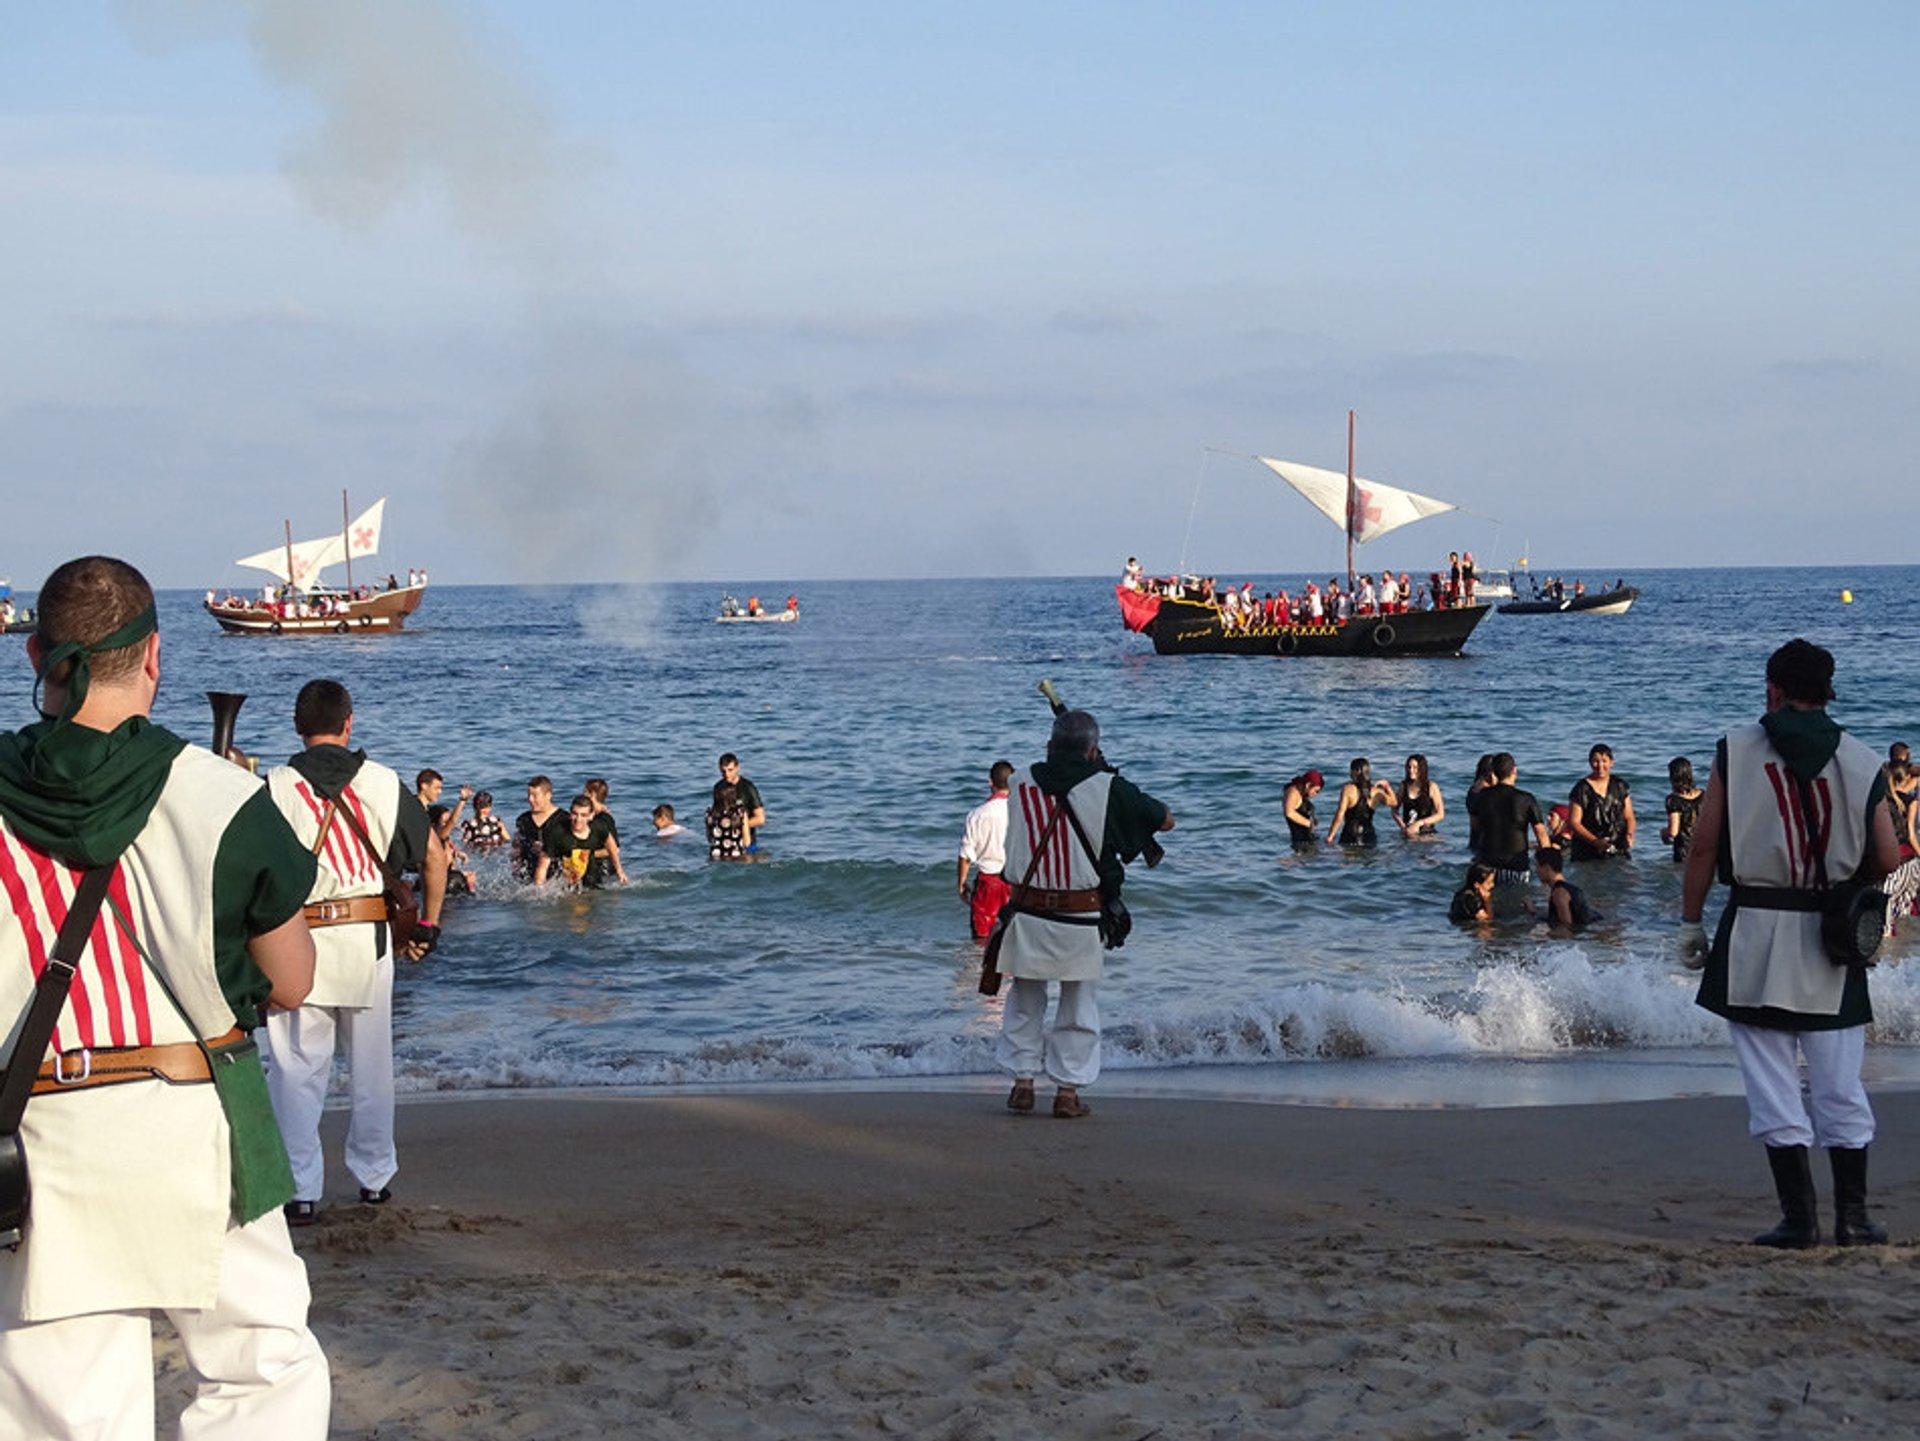 Villajoyosa Moors & Christians Festival in Alicante 2020 - Best Time